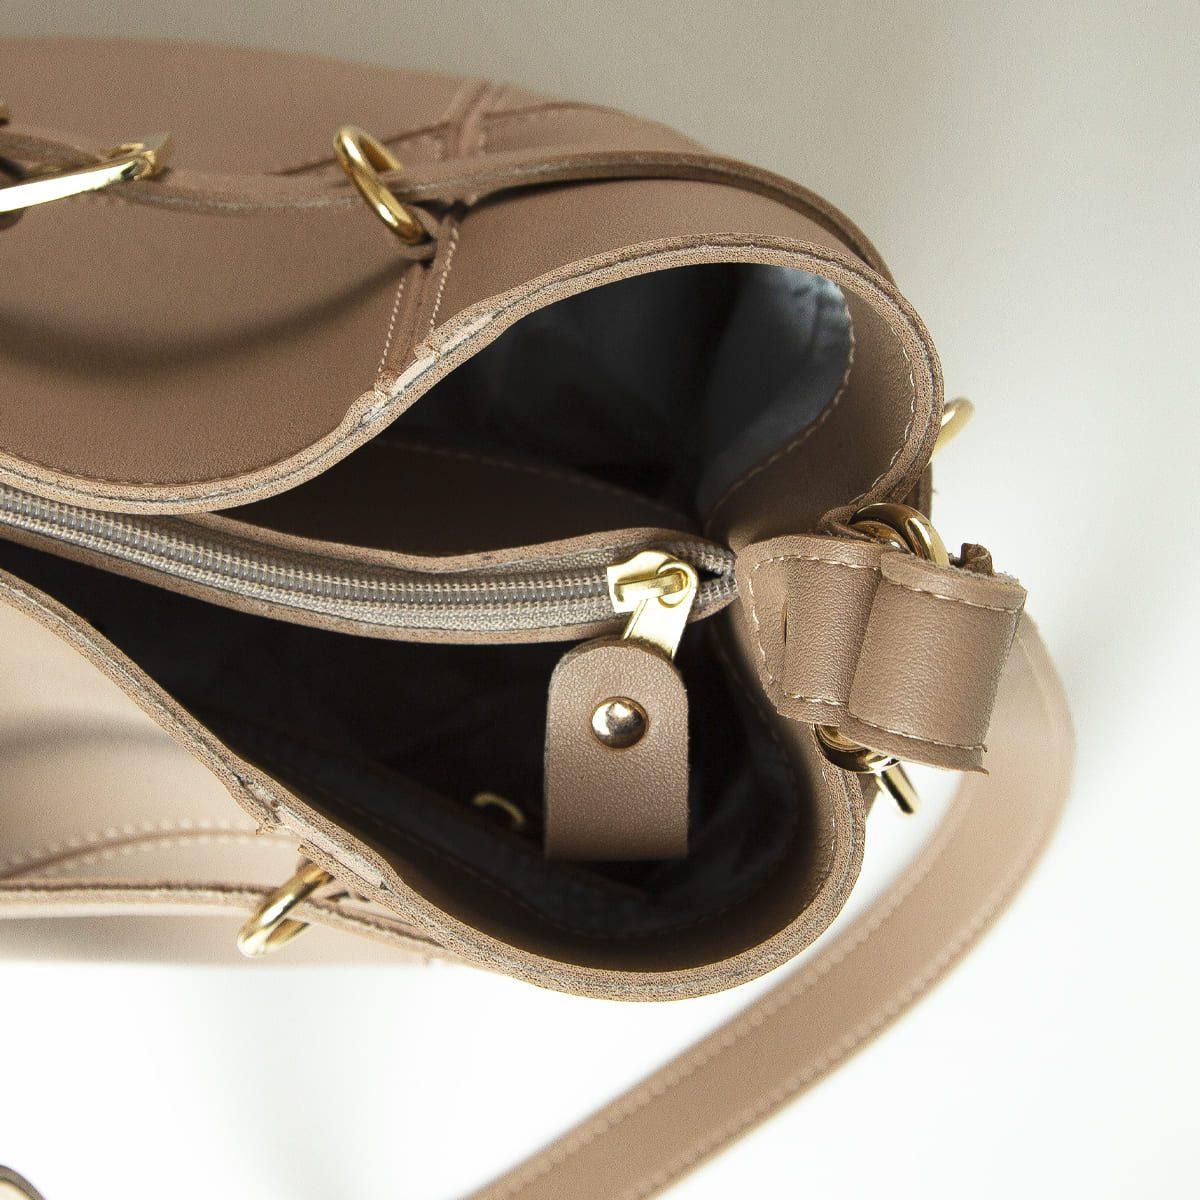 elena athanasiou bags γυναικειες δερματινες τσαντες